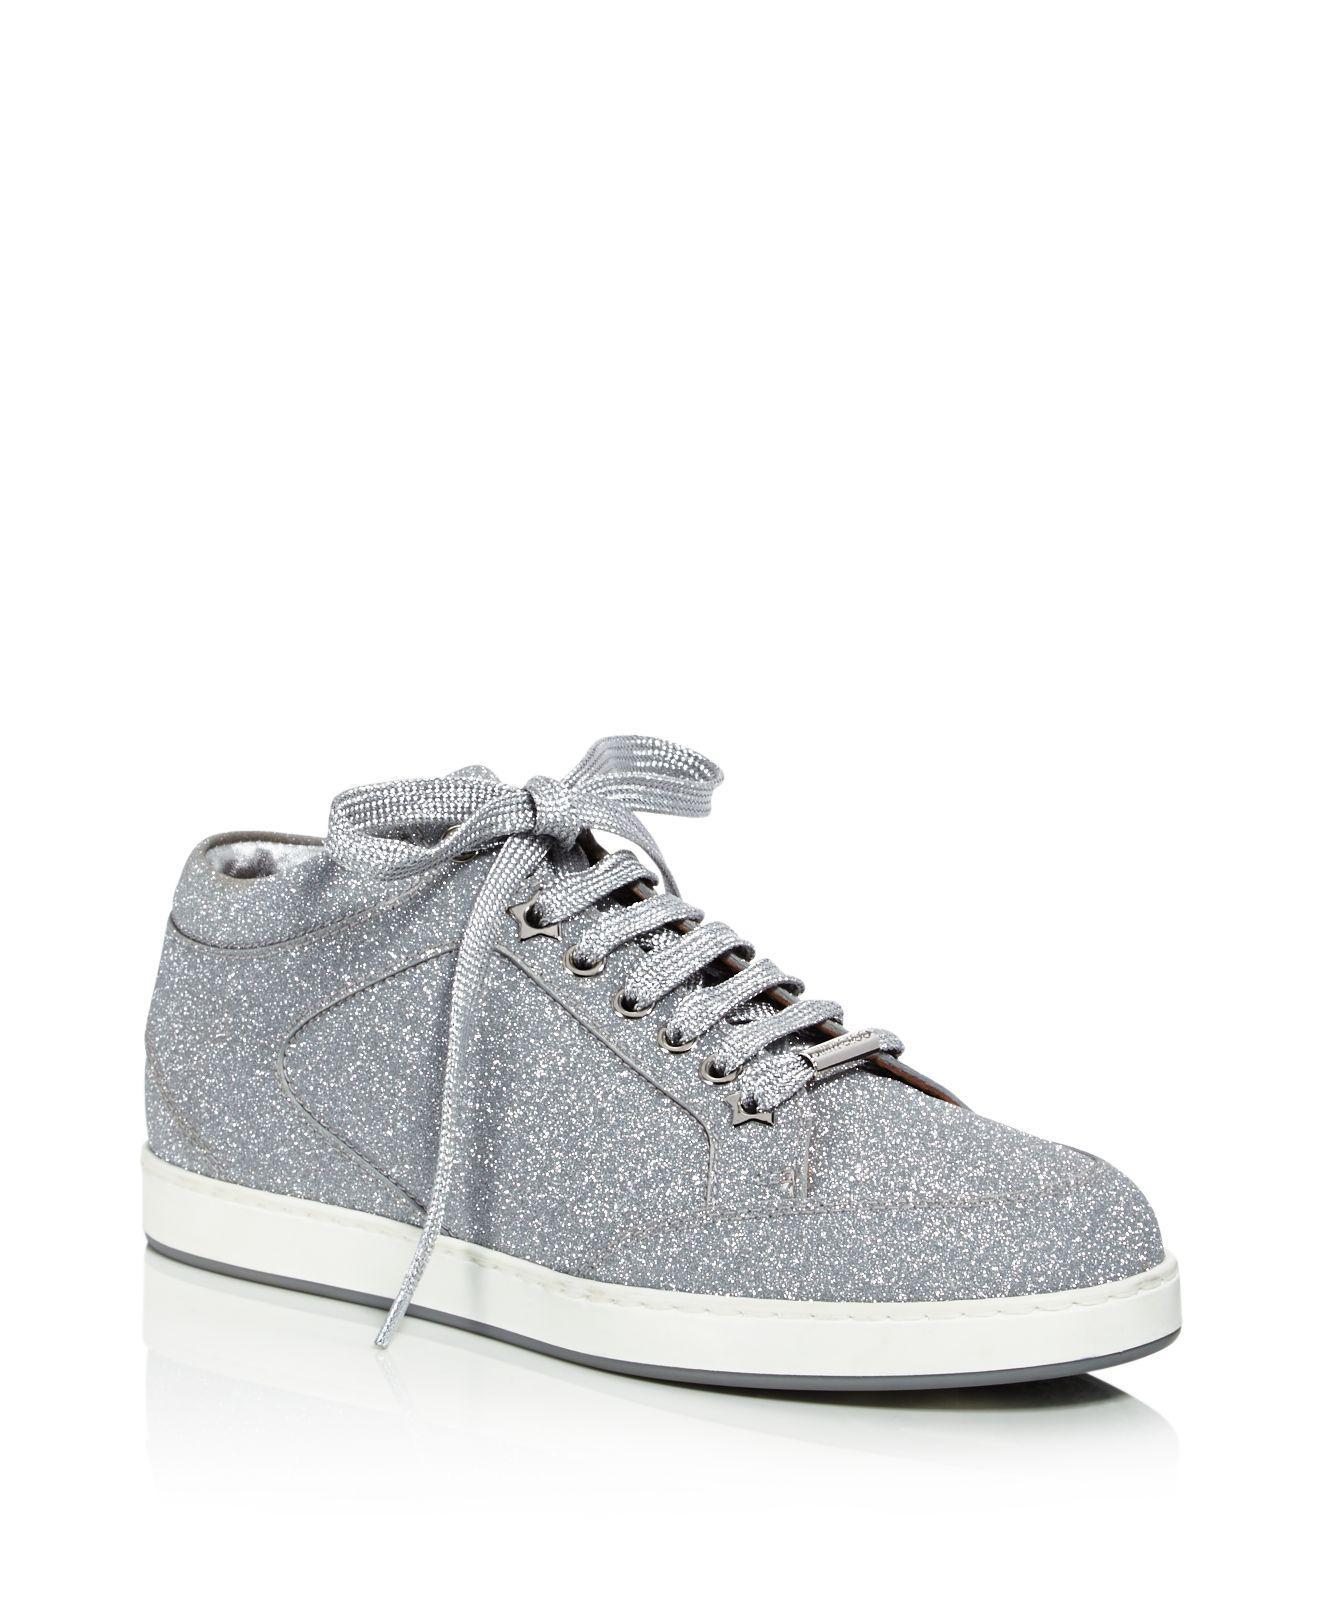 Miami Glitter-paneled Suede Sneakers - Beige Jimmy Choo London 7QQQ0nghgP